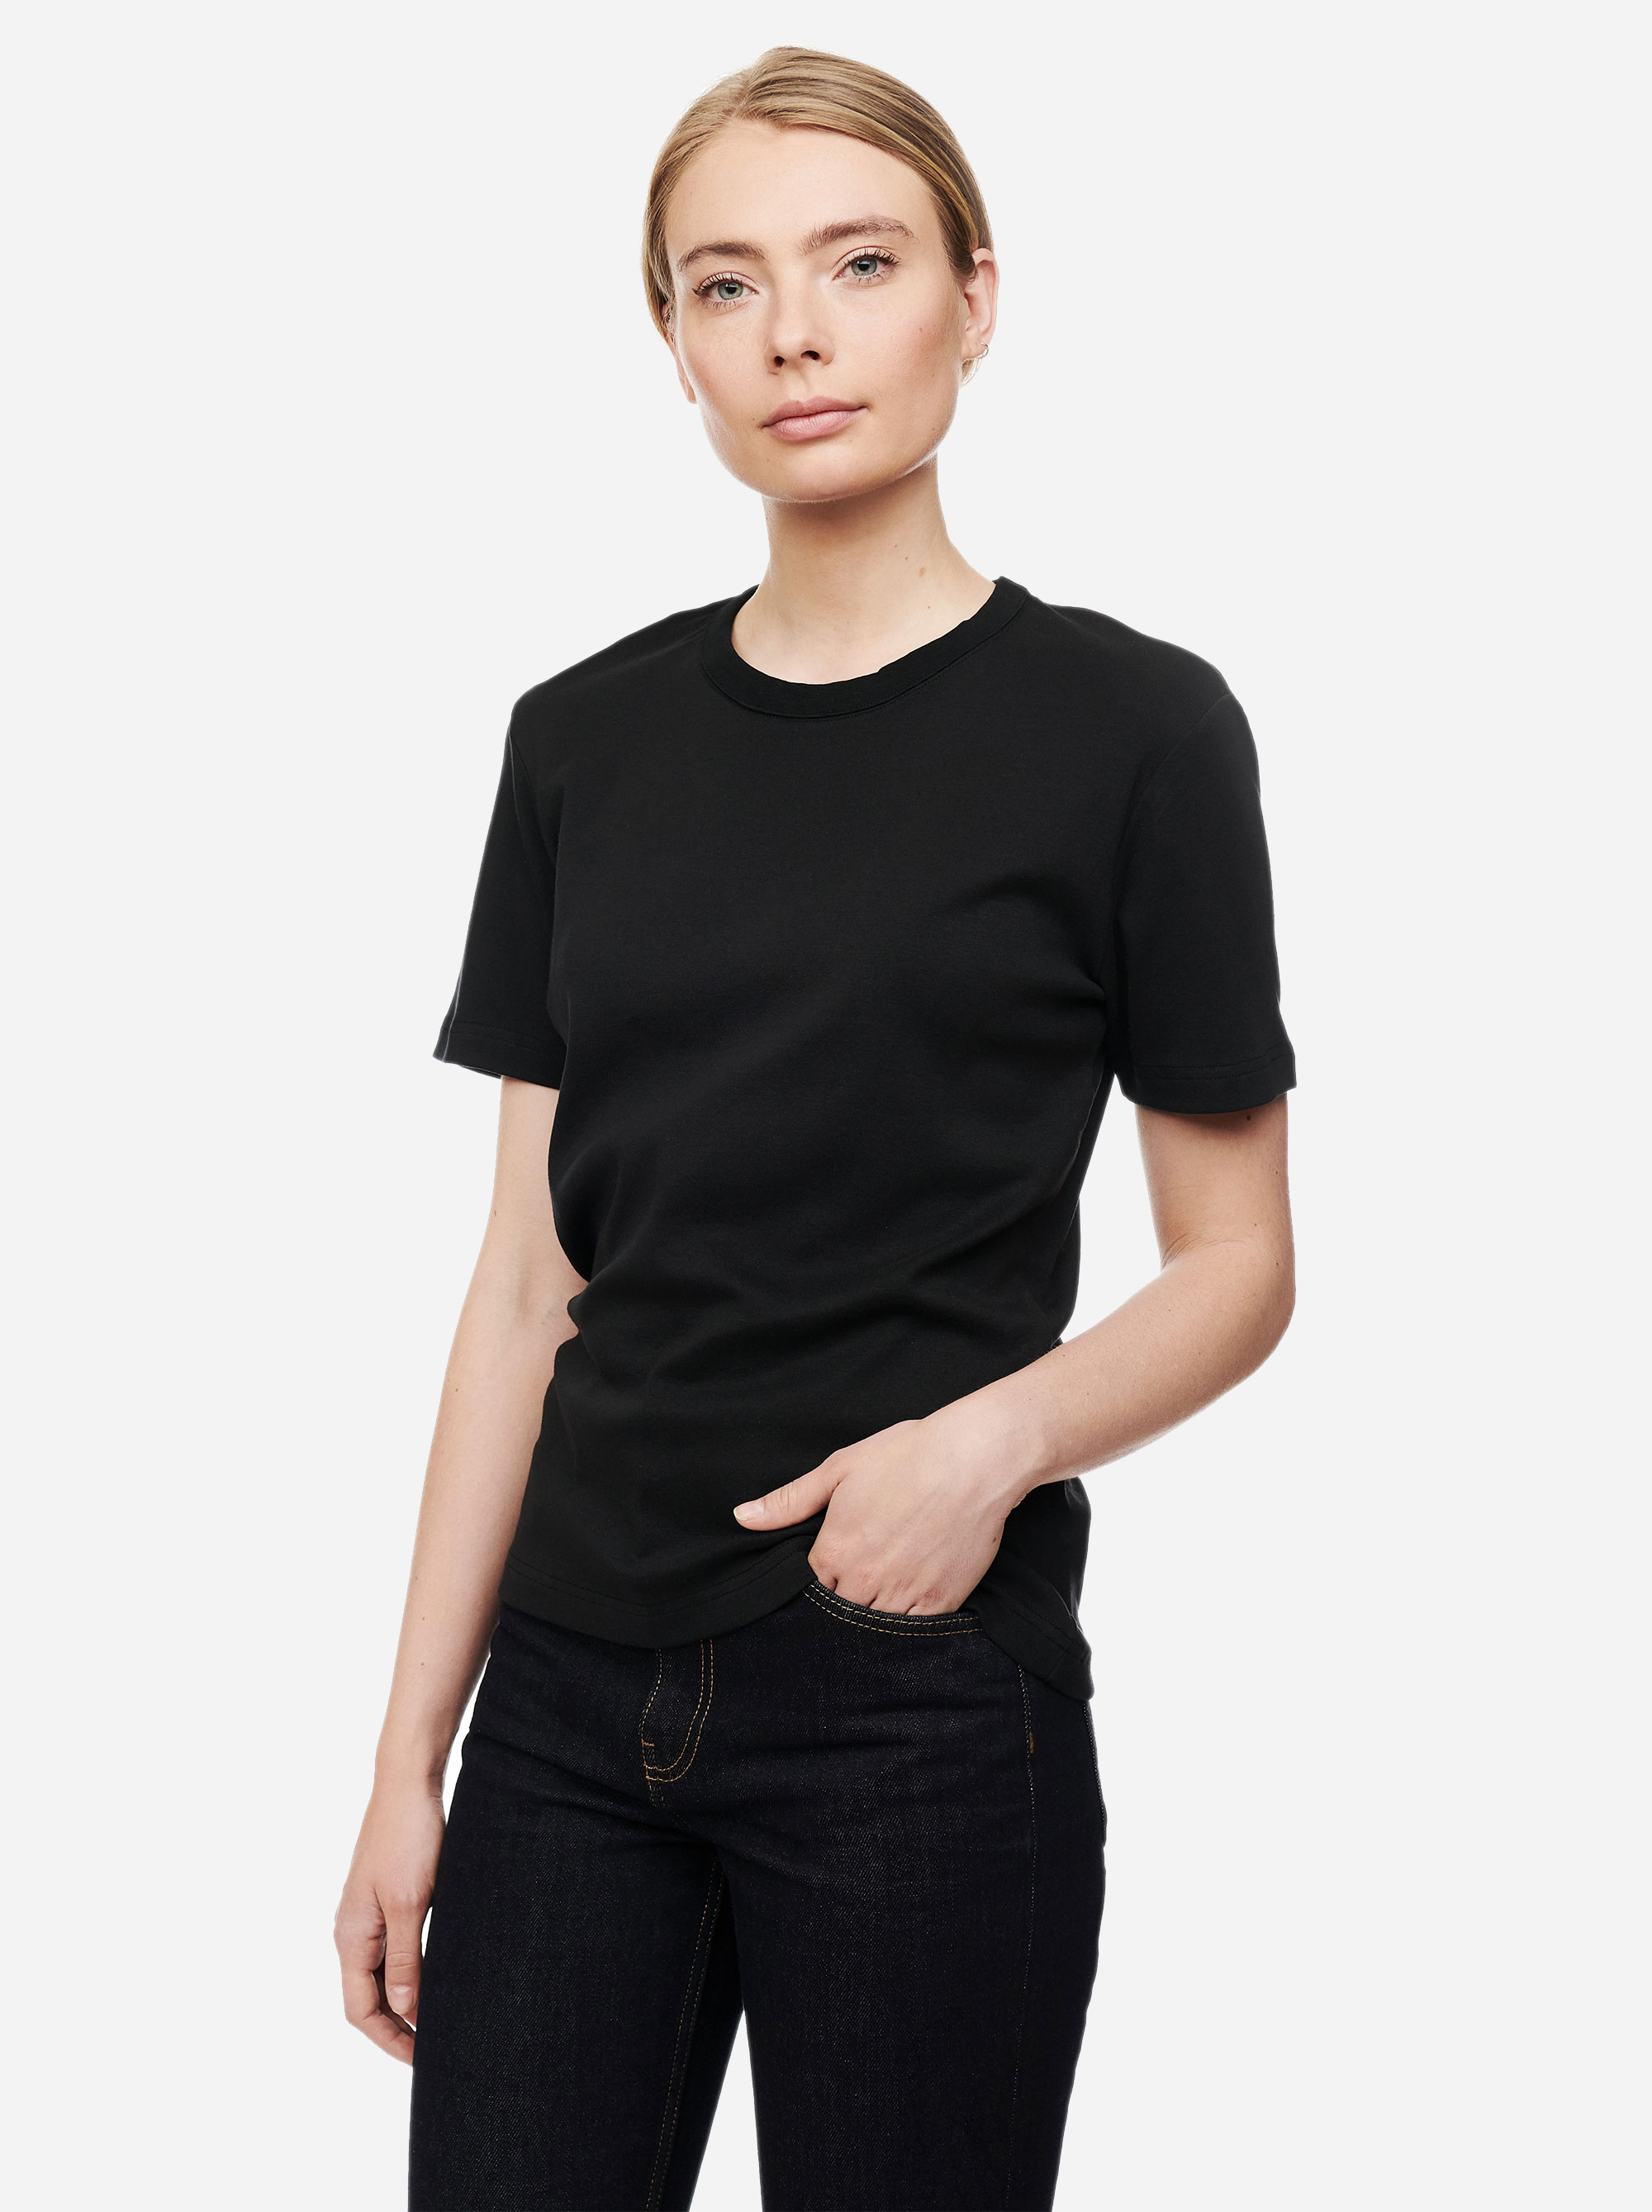 Teym - The T-Shirt - Women - Black2